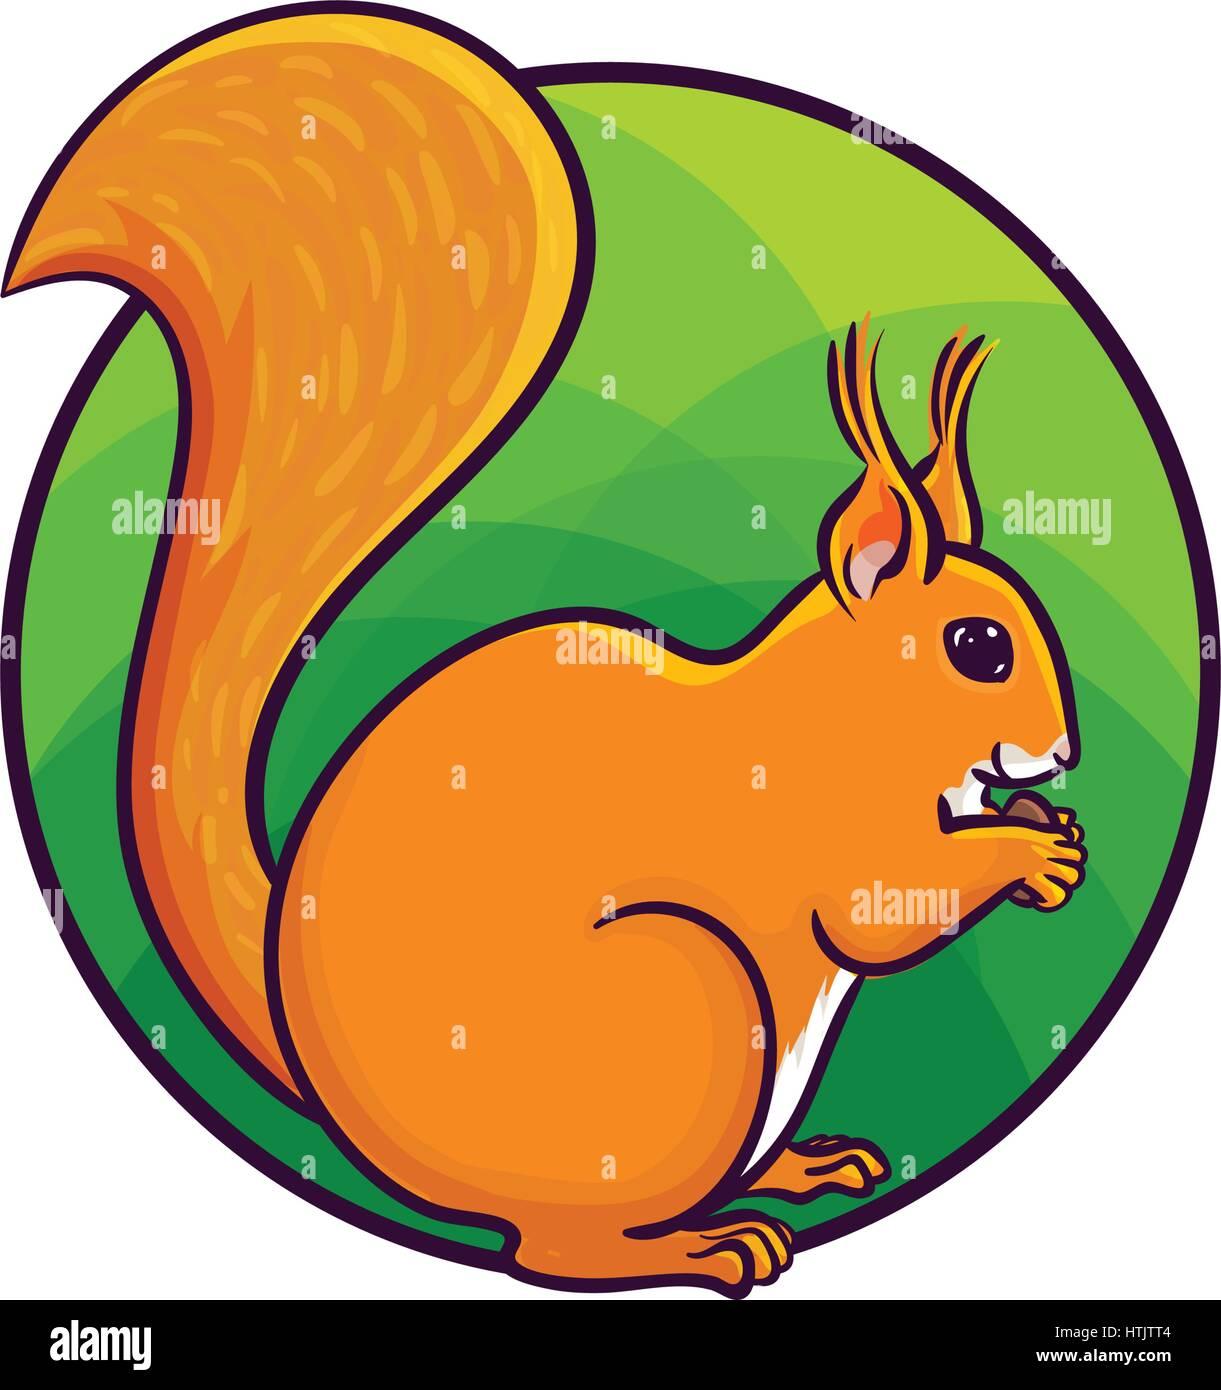 Animal Art Cute Cartoon Style Hand Drawn Vector Illustration Red Tree Squirrel Eating Nut